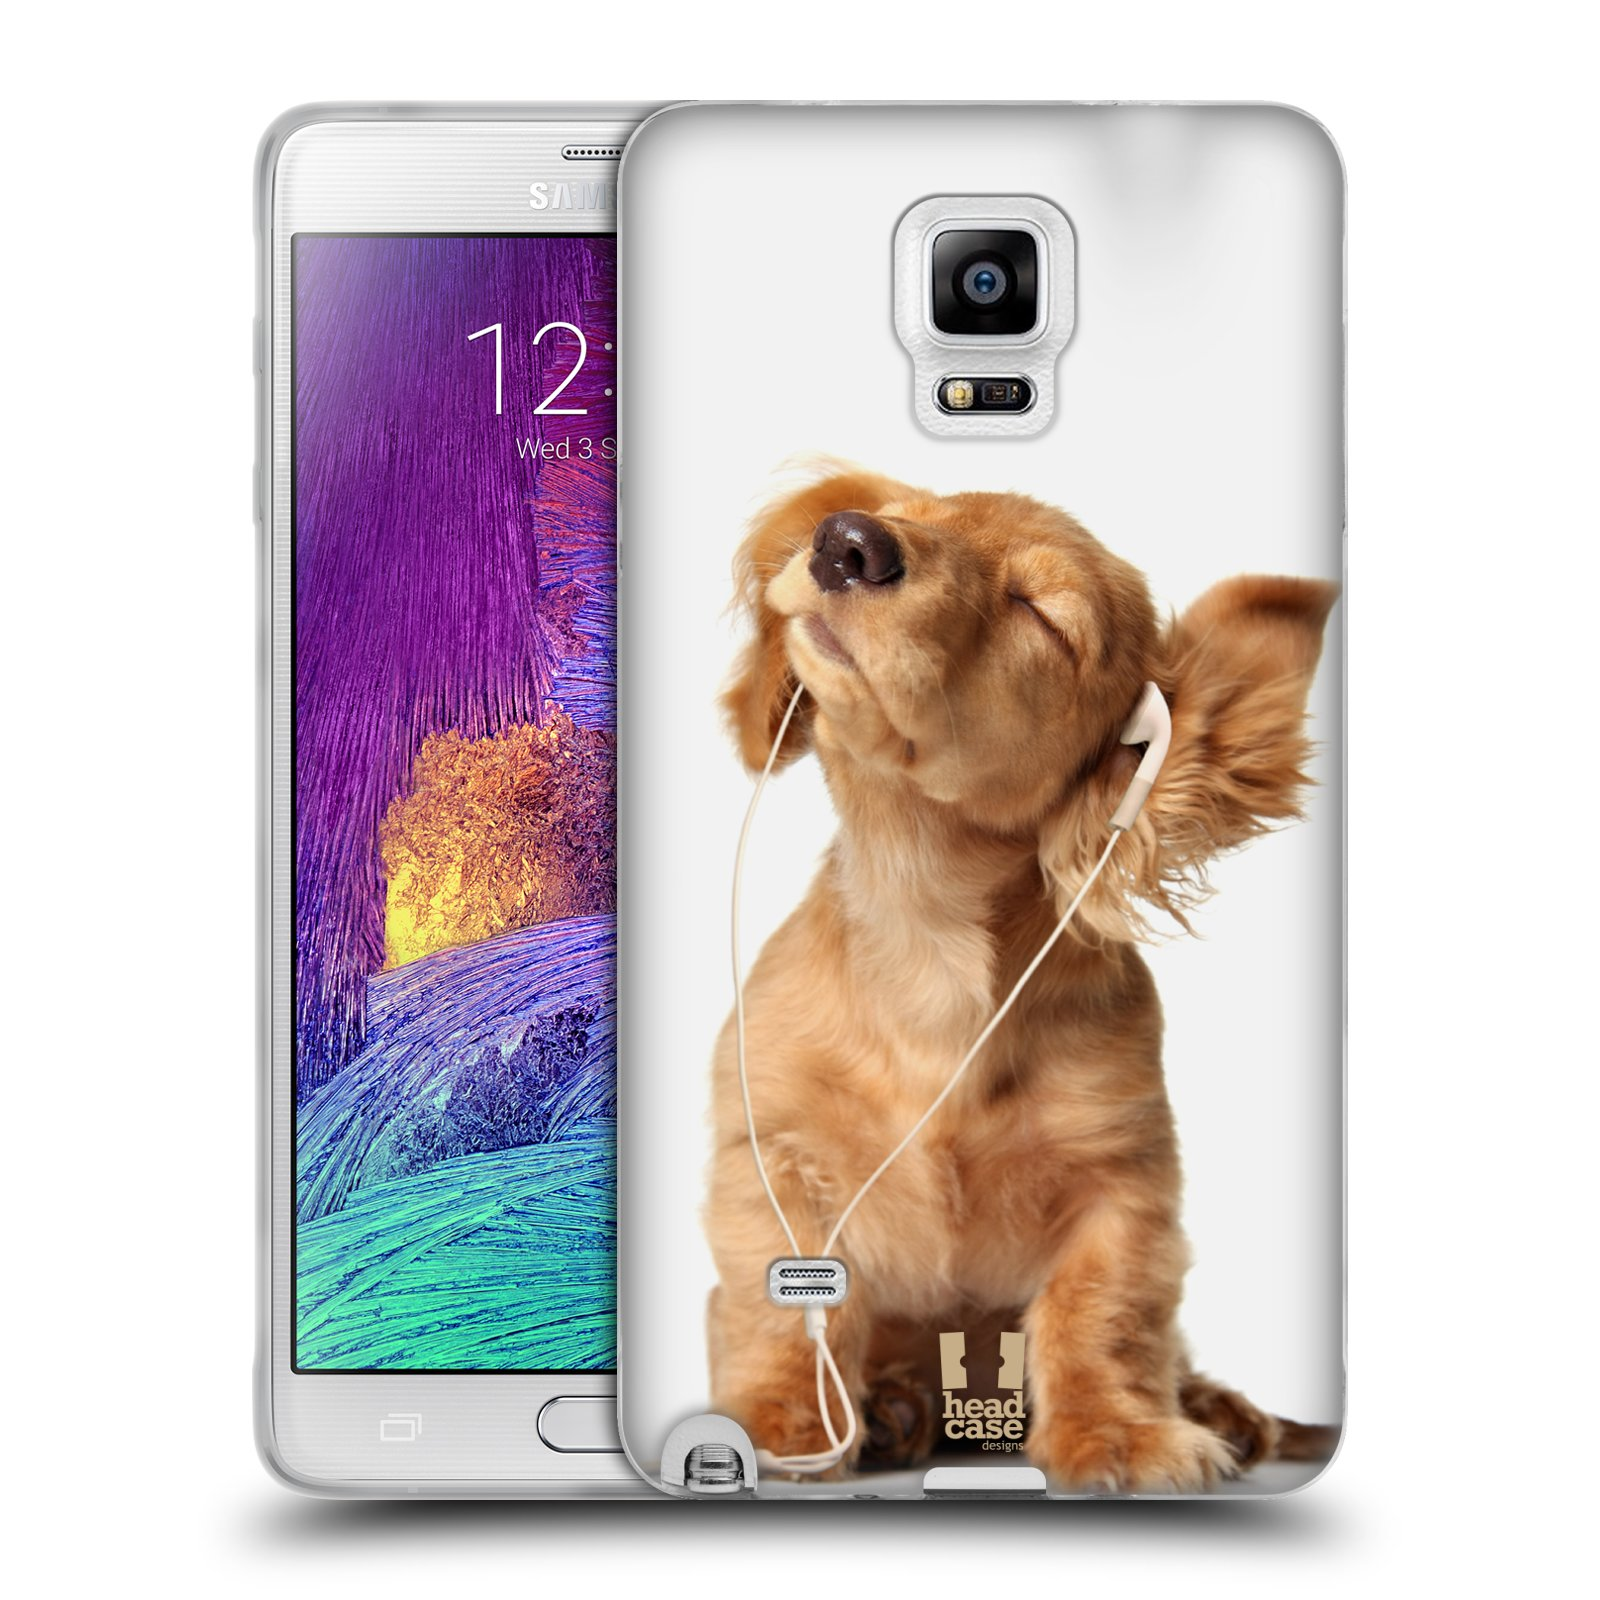 HEAD CASE silikonový obal na mobil Samsung Galaxy Note 4 (N910) vzor Legrační zvířátka roztomilé štěňátko se sluchátky MUSIC